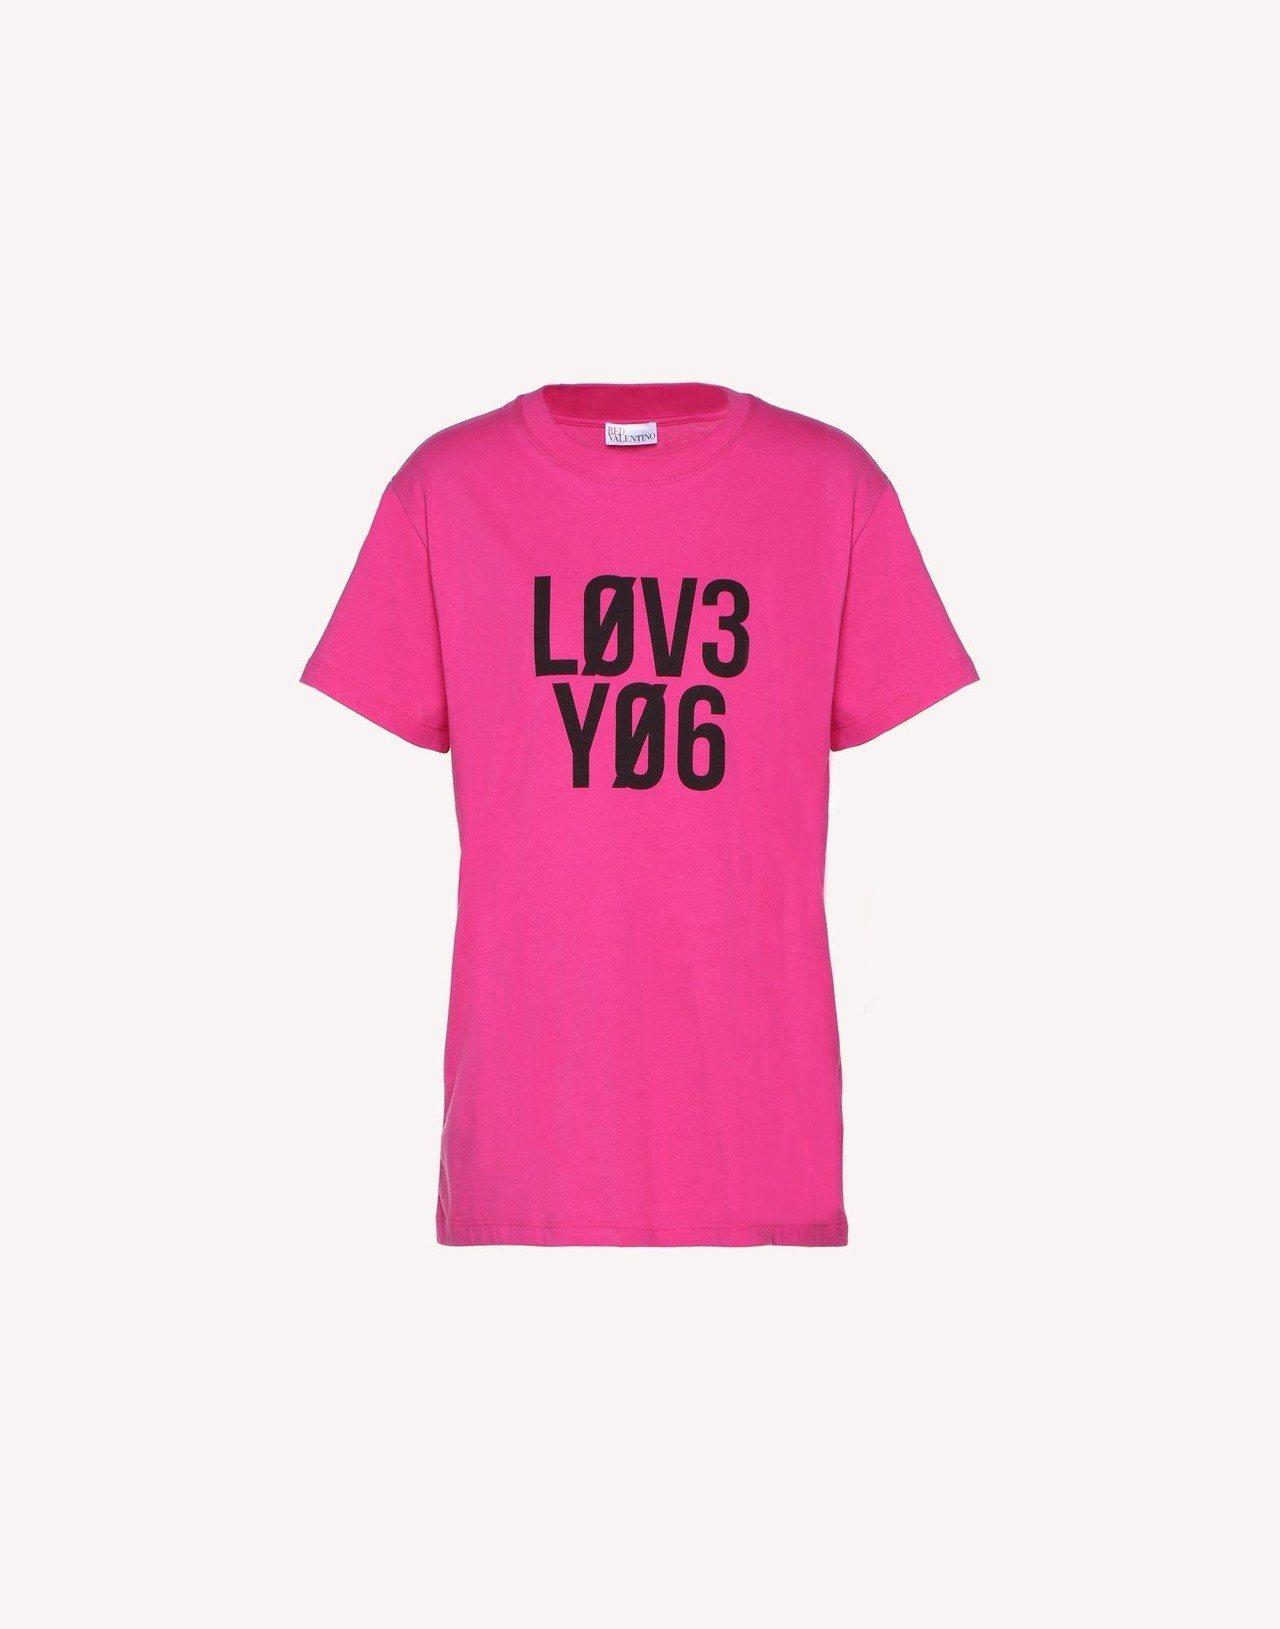 「LOVE YOU」密碼標語T恤,6,900元。圖/REDValentino提供